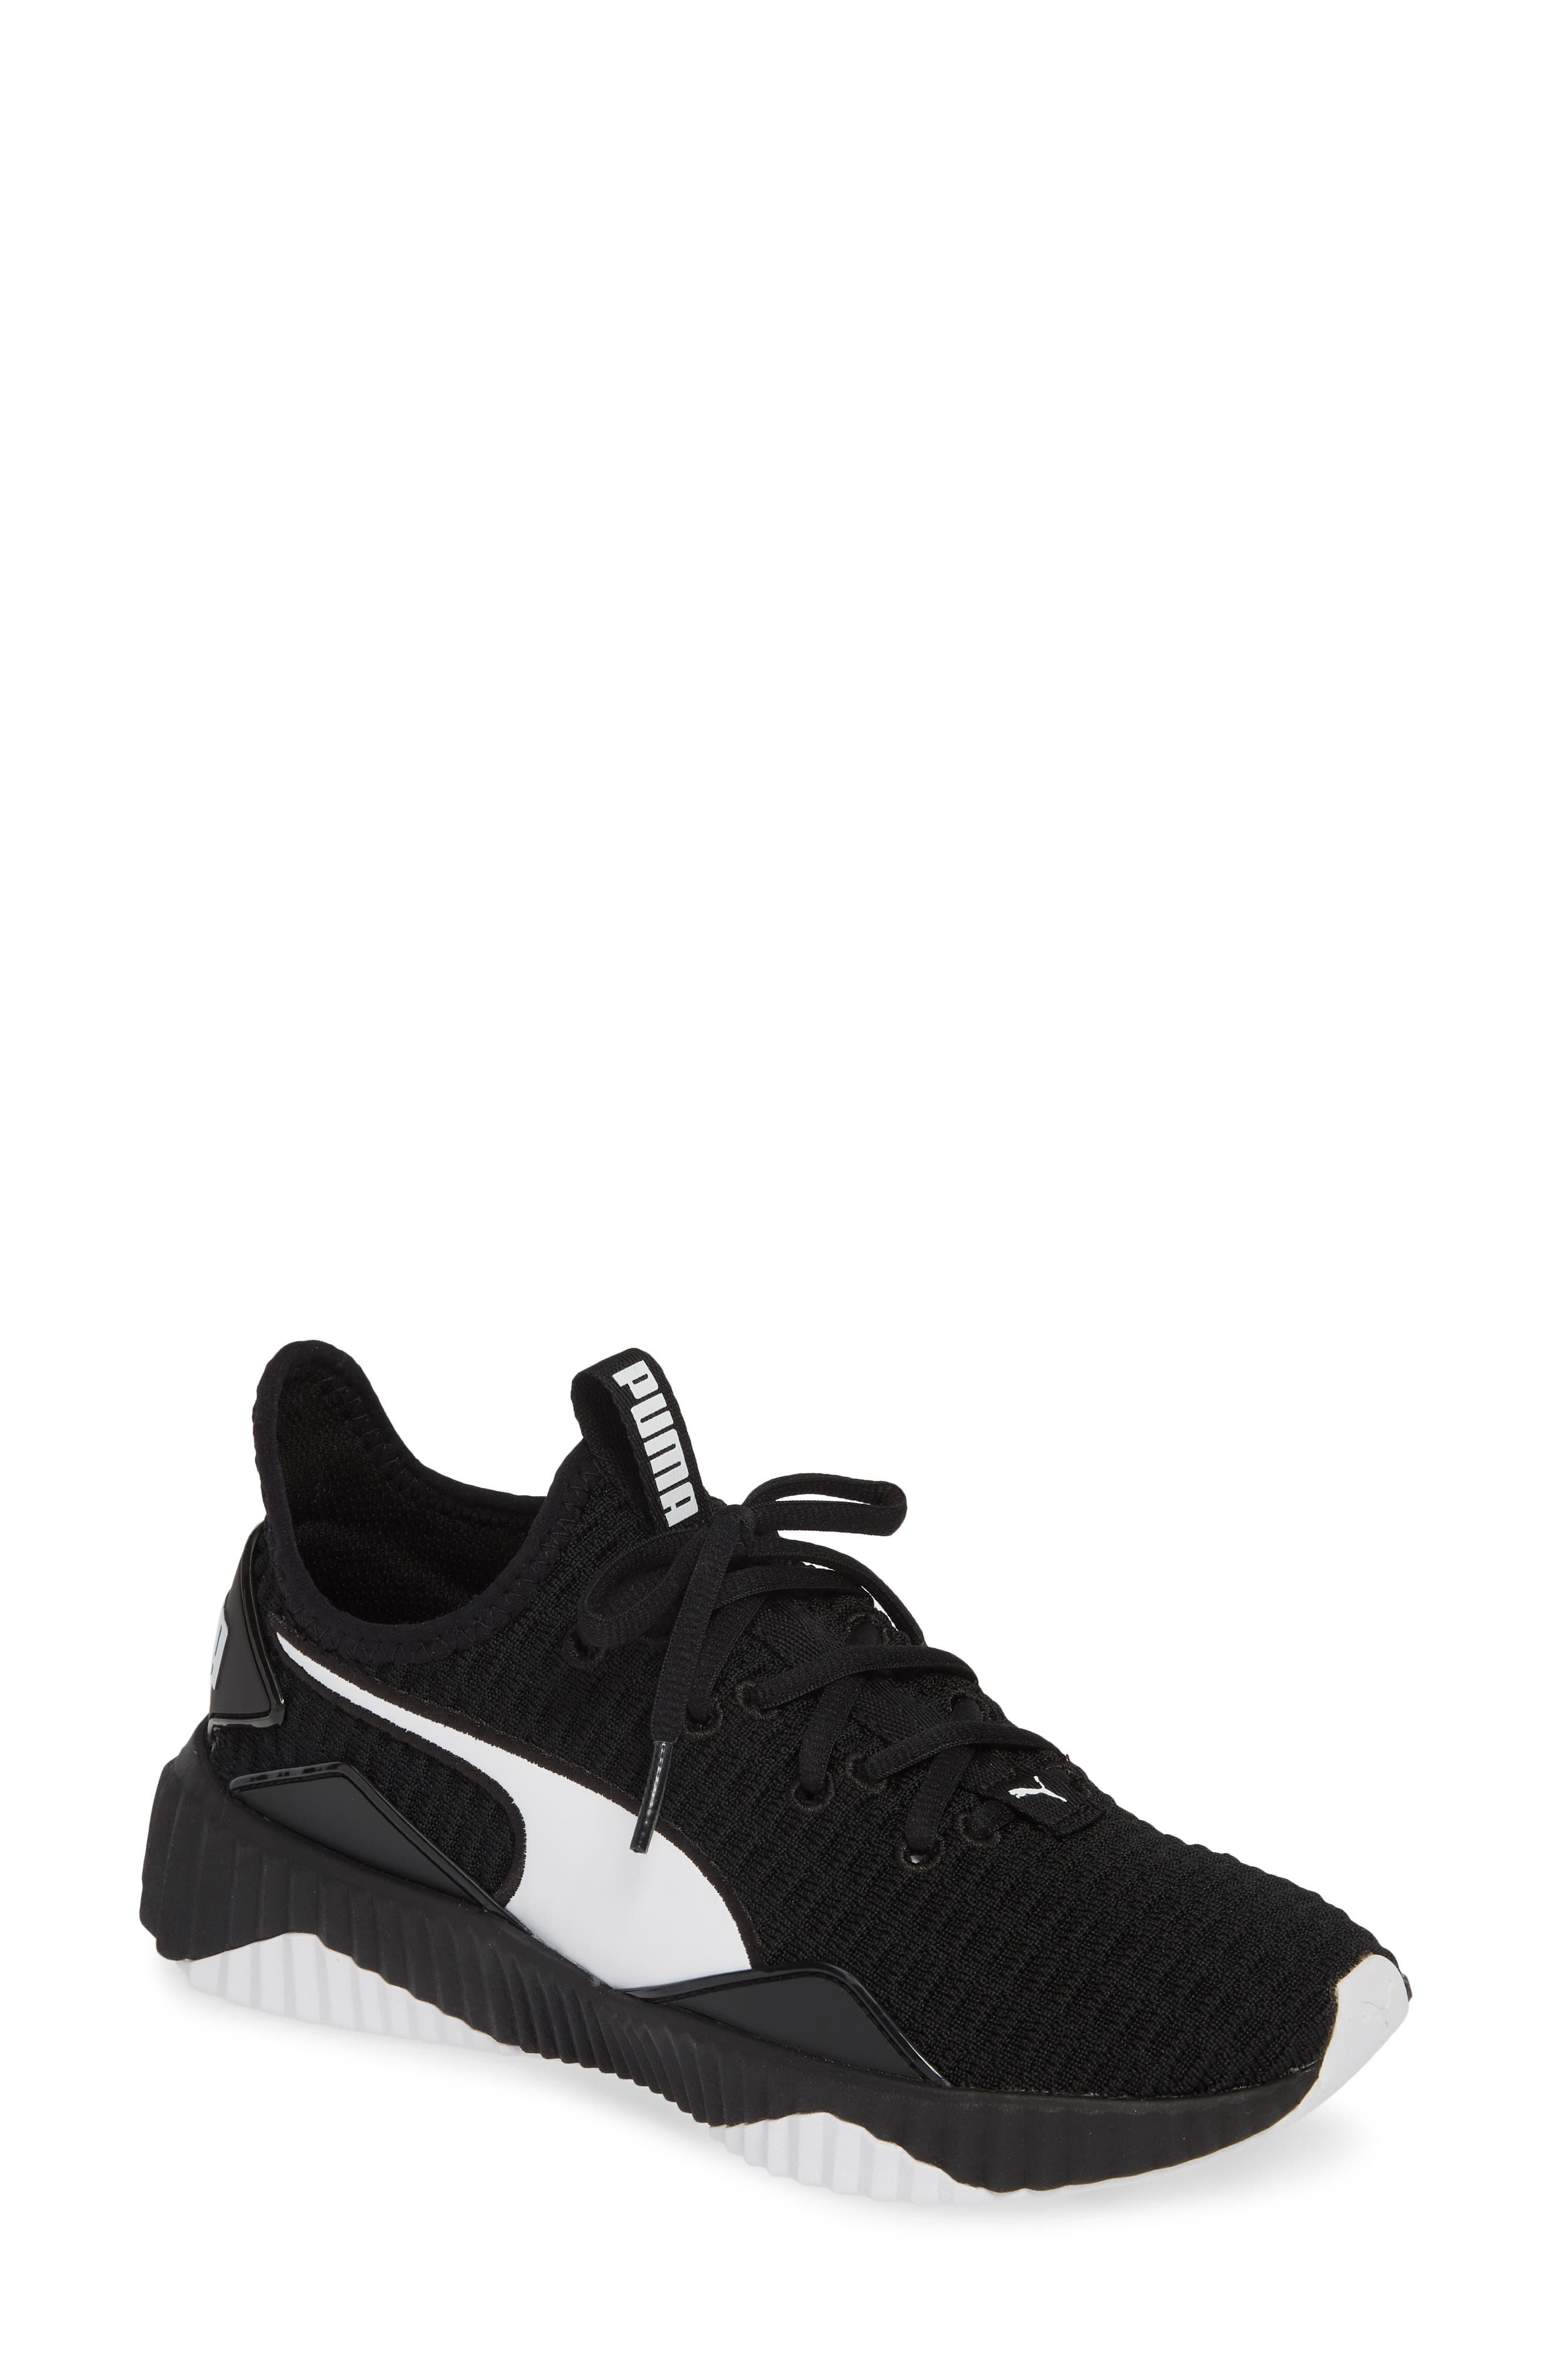 PUMA, Defy Sneaker, Main thumbnail 1, color, BLACK/ WHITE